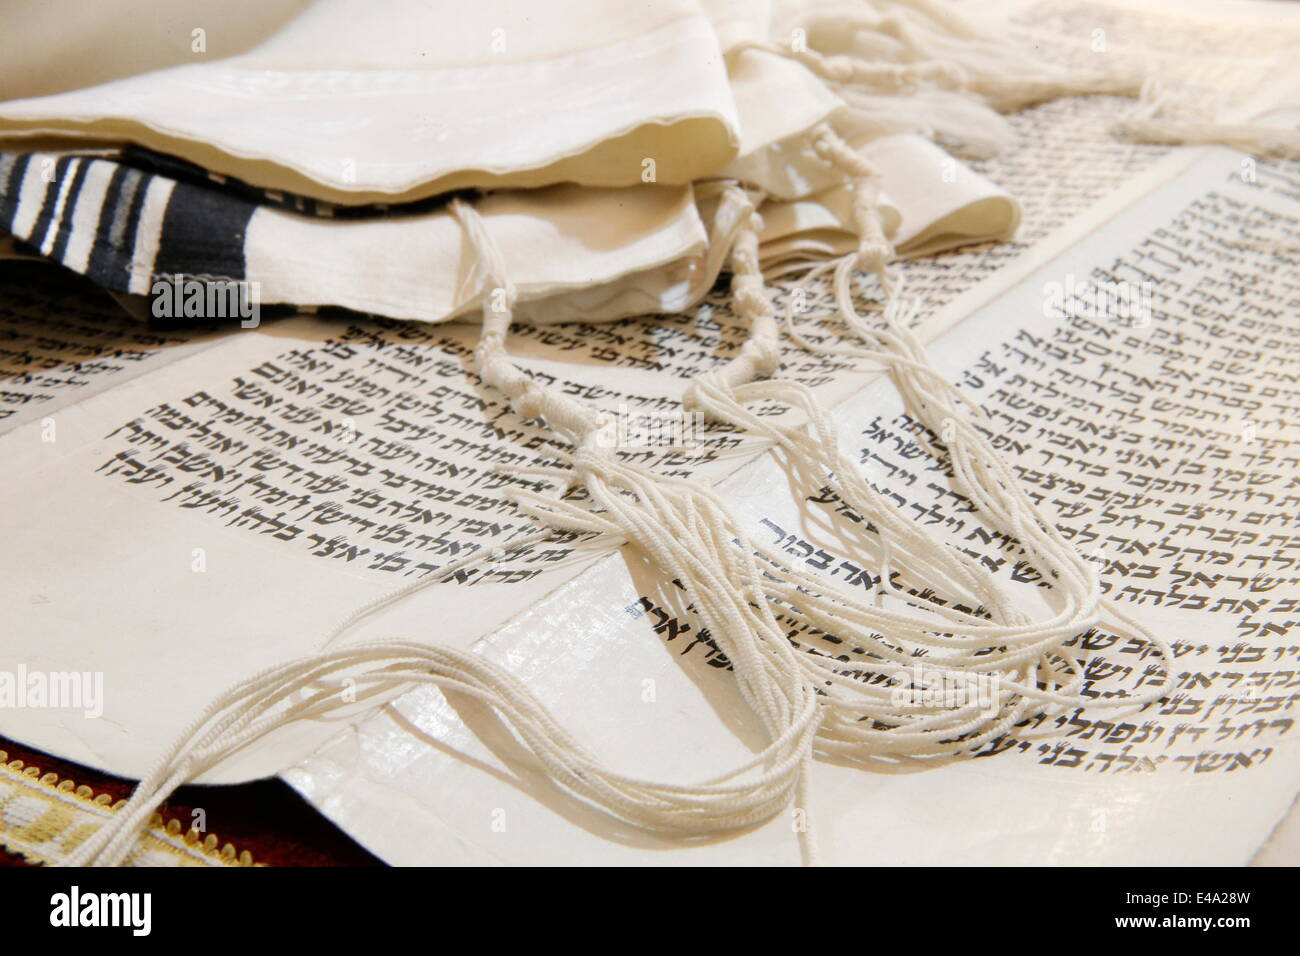 Torah scroll and Tallit, Jewish prayer shawl, Paris, France, Europe - Stock Image